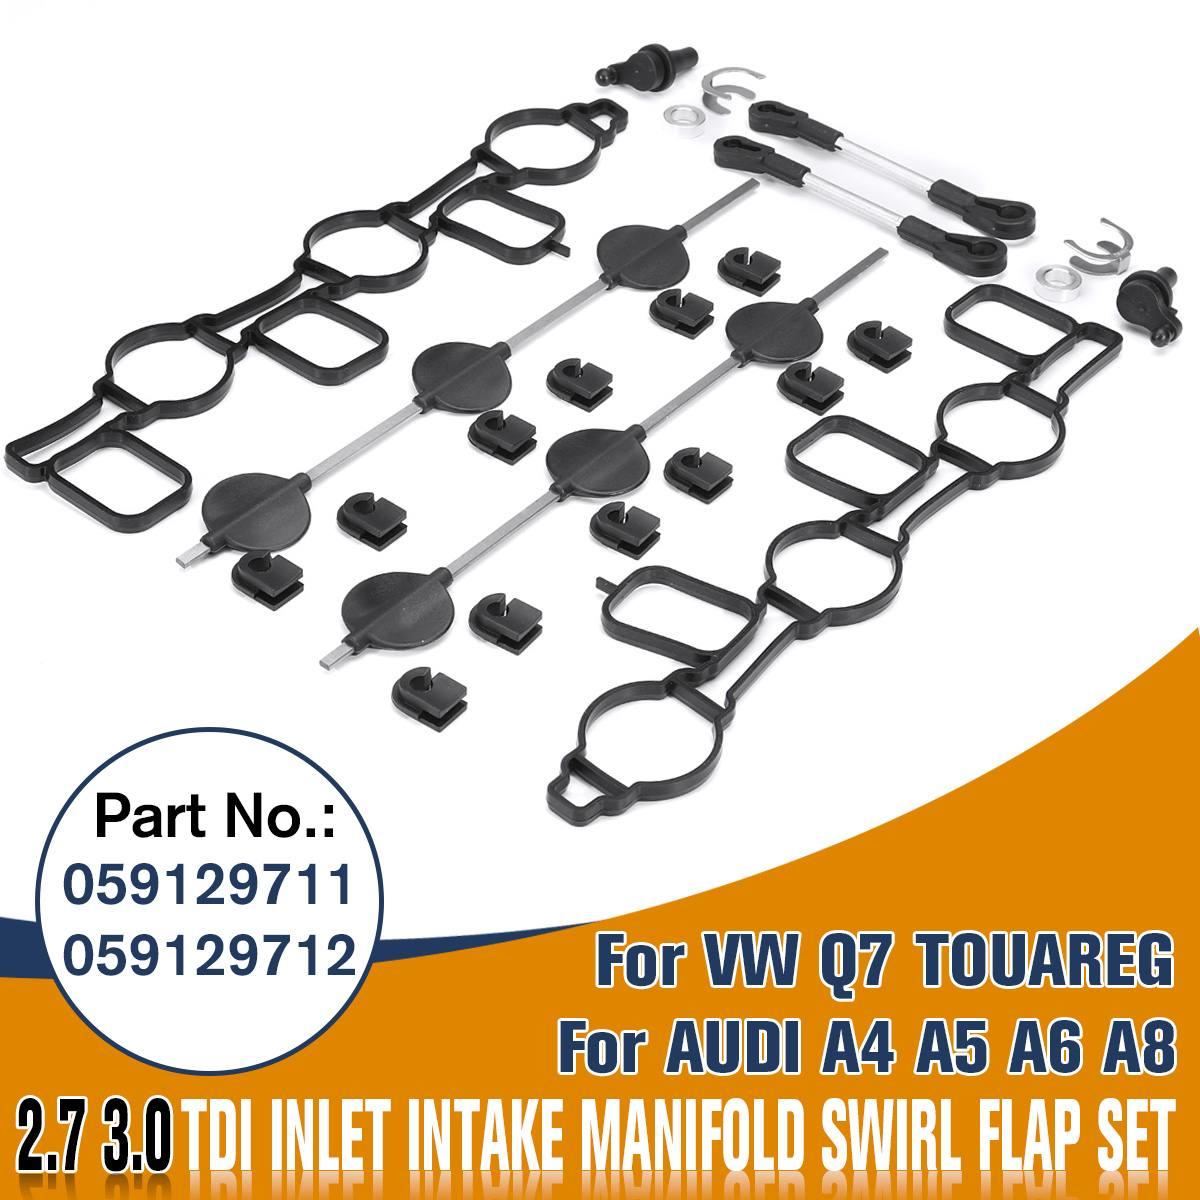 New INTAKE MANIFOLD SWIRL FLAPS 2.7 3.0 TDI GASKET KIT 059129711 & 059129712 For Audi A4 A5 A6 A8 For VW TOUAREG Phaeton